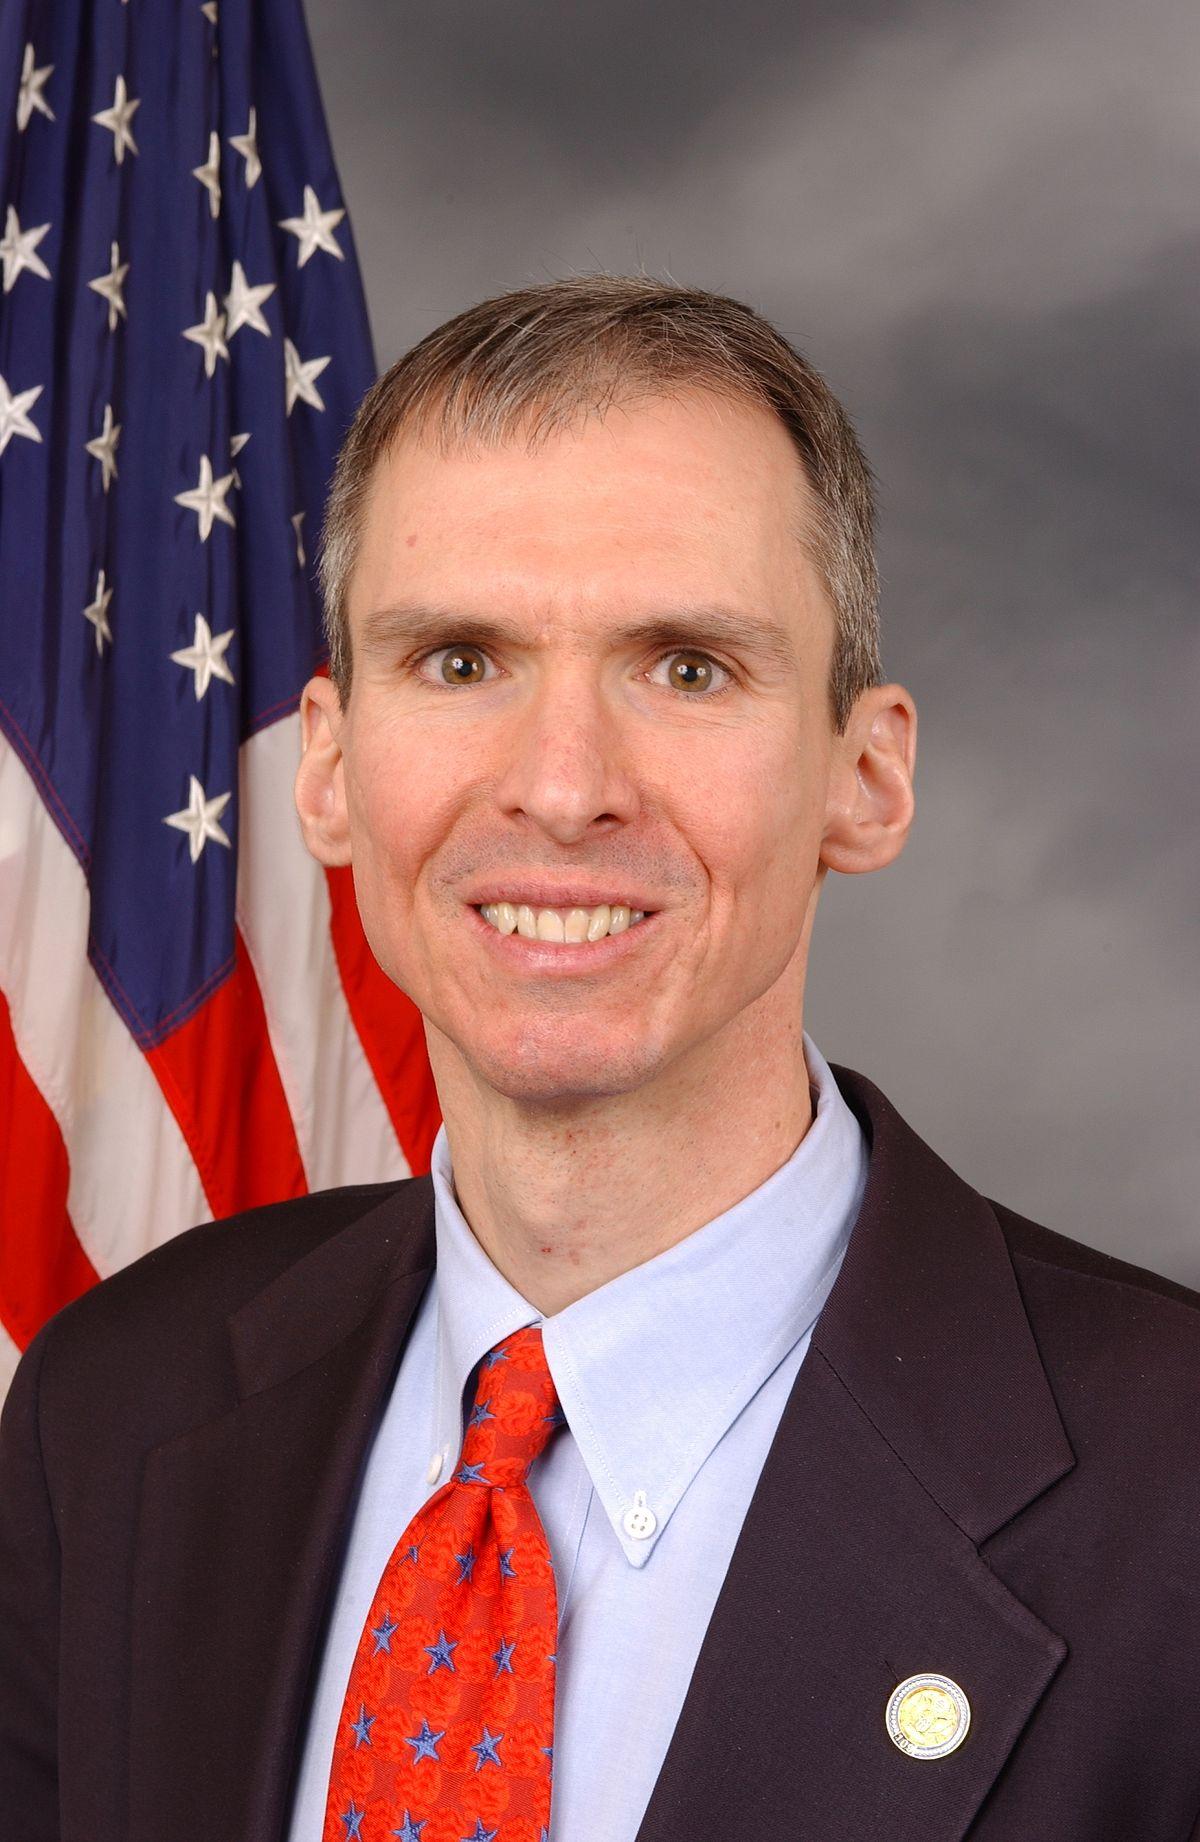 Congressman Dan Lipinski